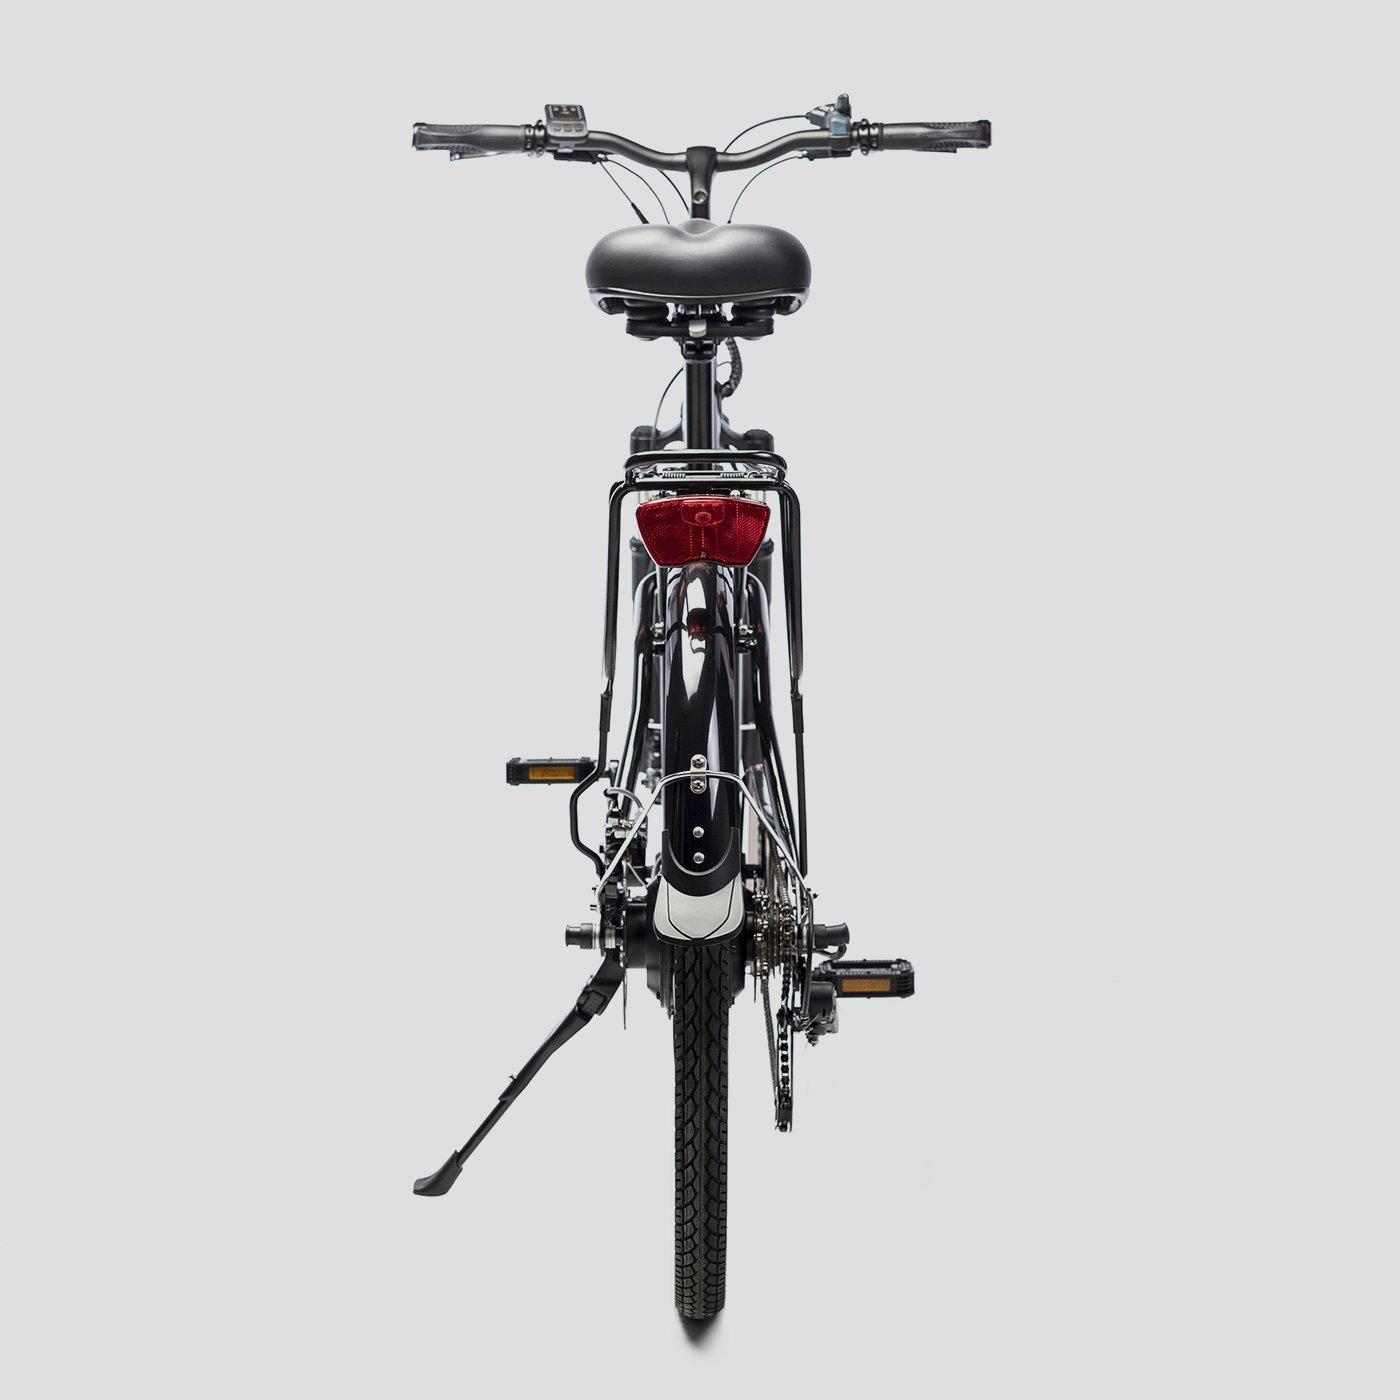 Bicicleta eléctrica de paseo Biwbik Sunray black